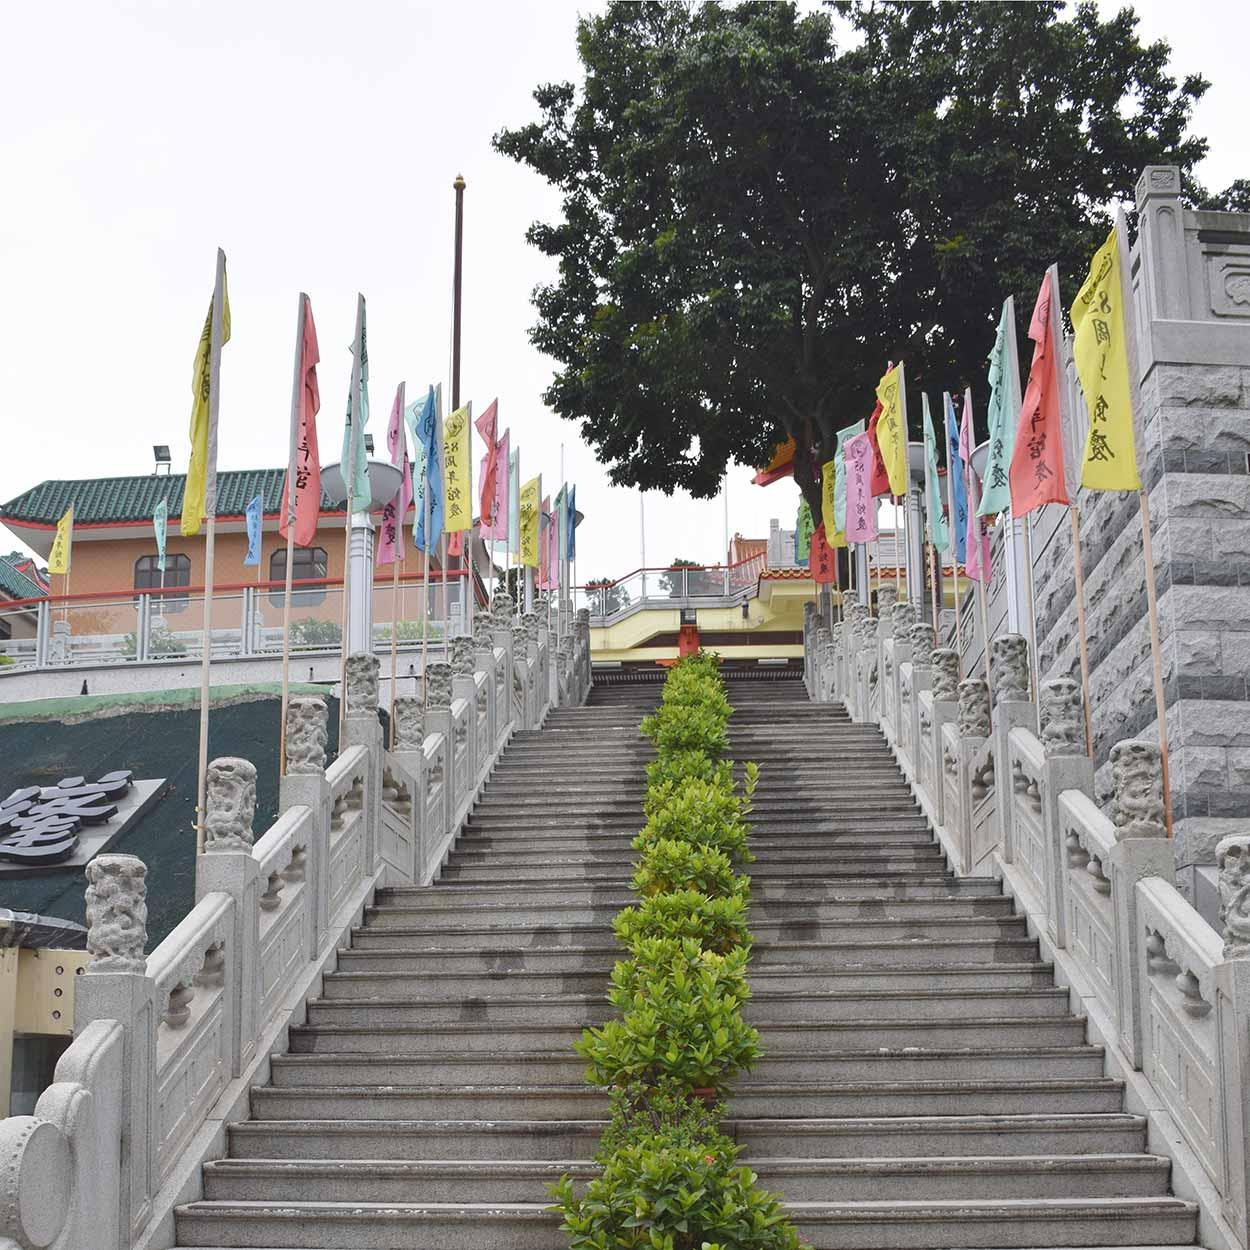 Fung Ying Seen Koon, Fanling, Hong Kong, China